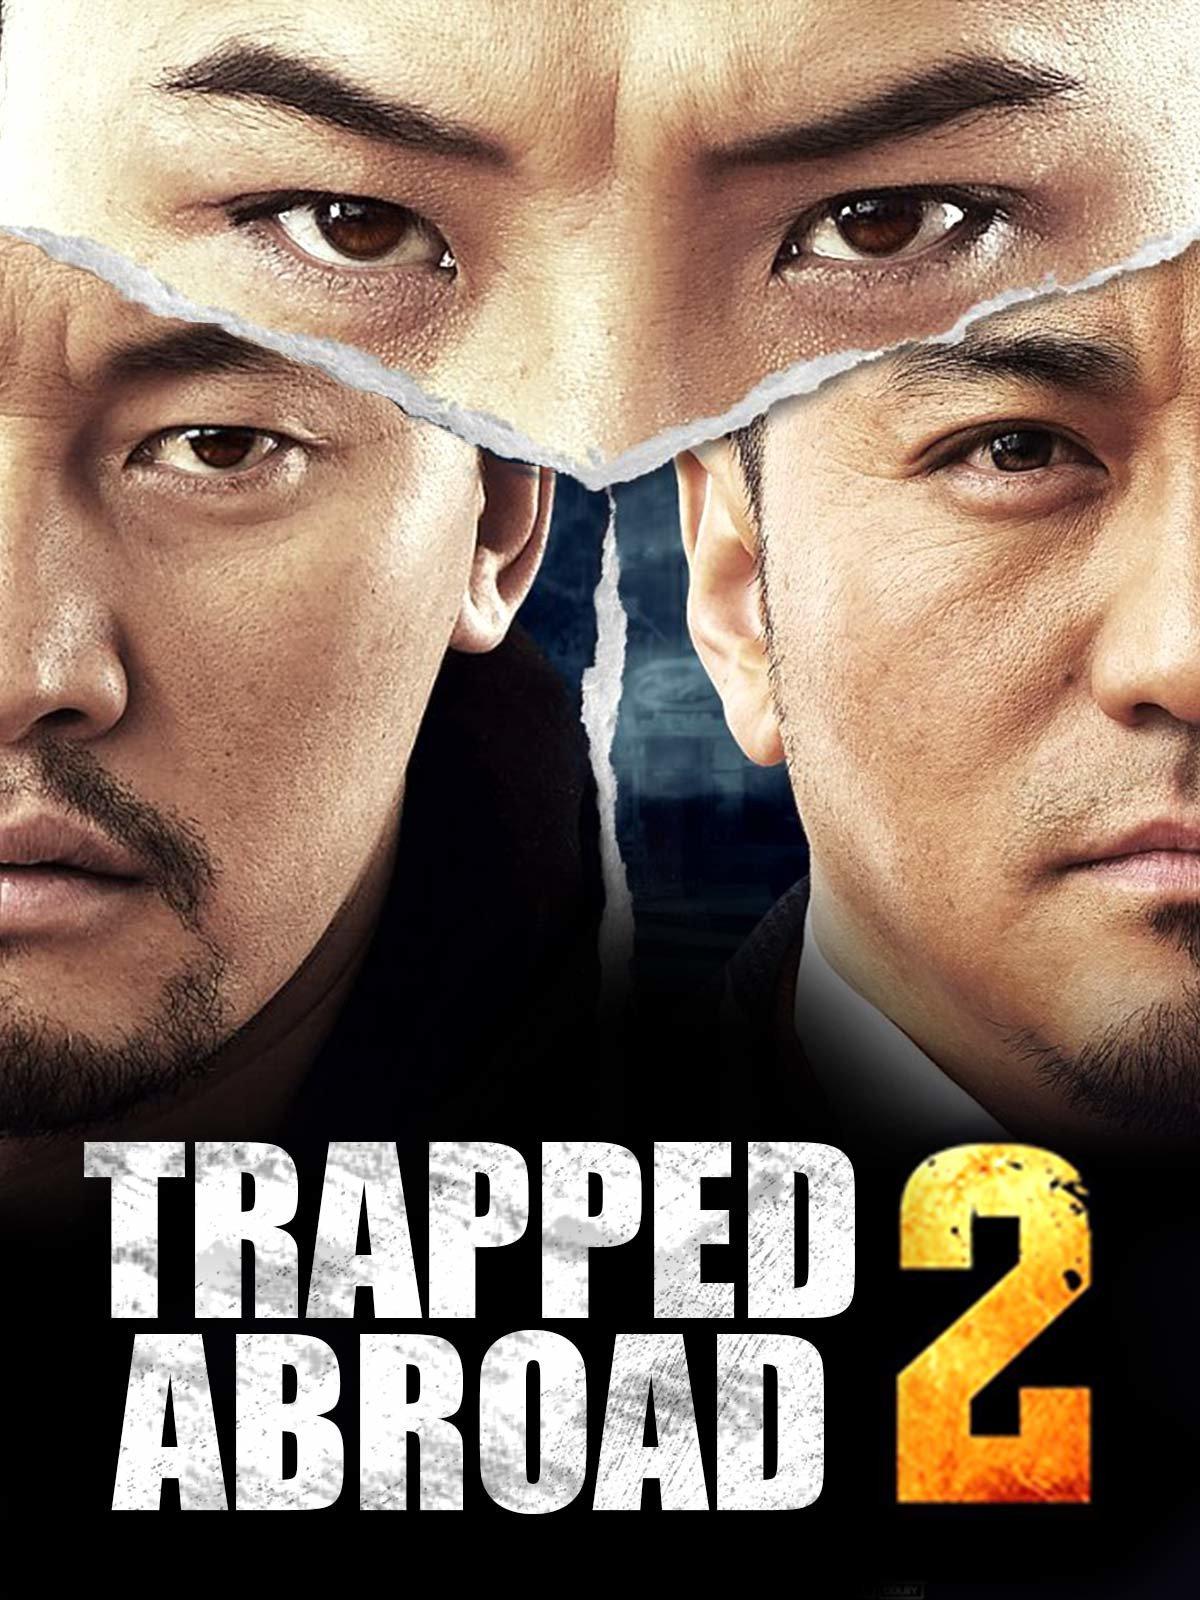 Trapped Abroad 2 2016 Hindi Dual Audio 500MB HDRip 720p HEVC x265 ESubs